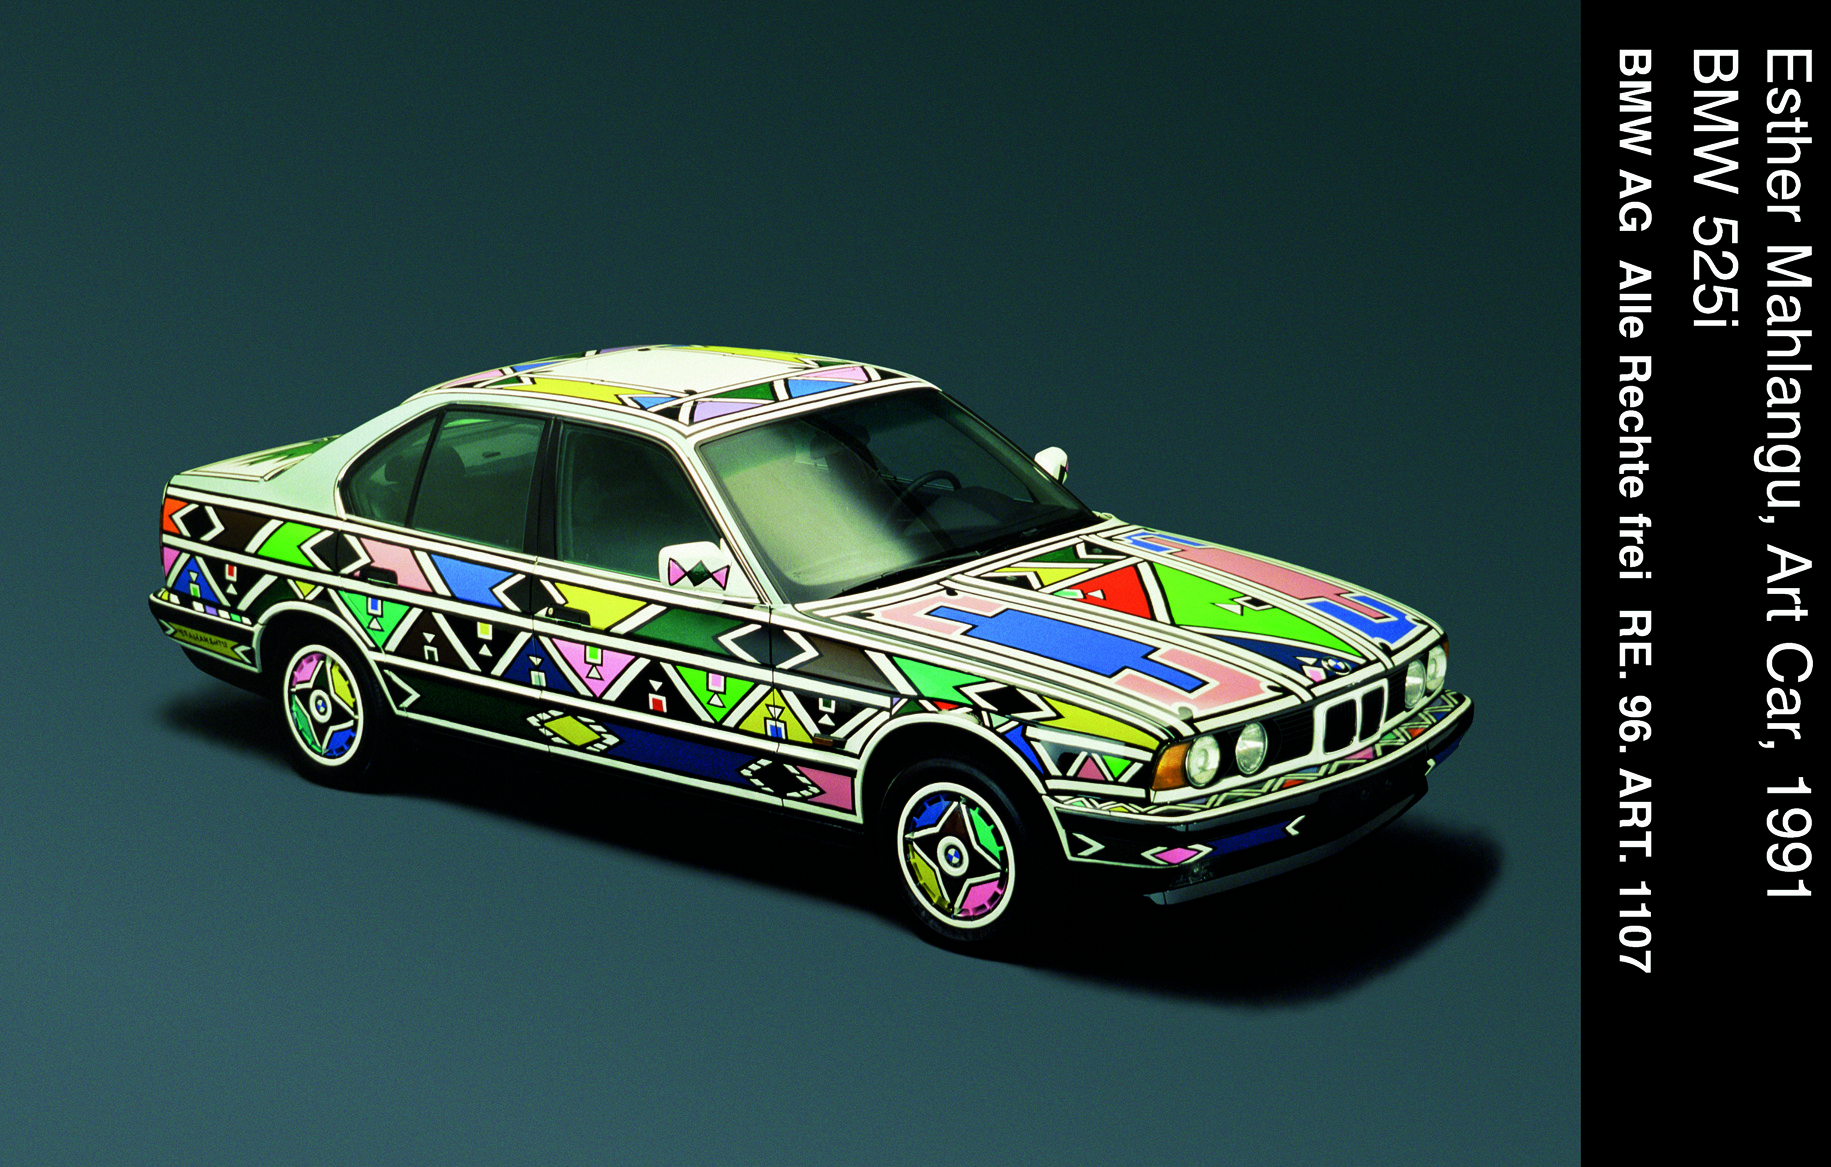 BMW ndebele - car